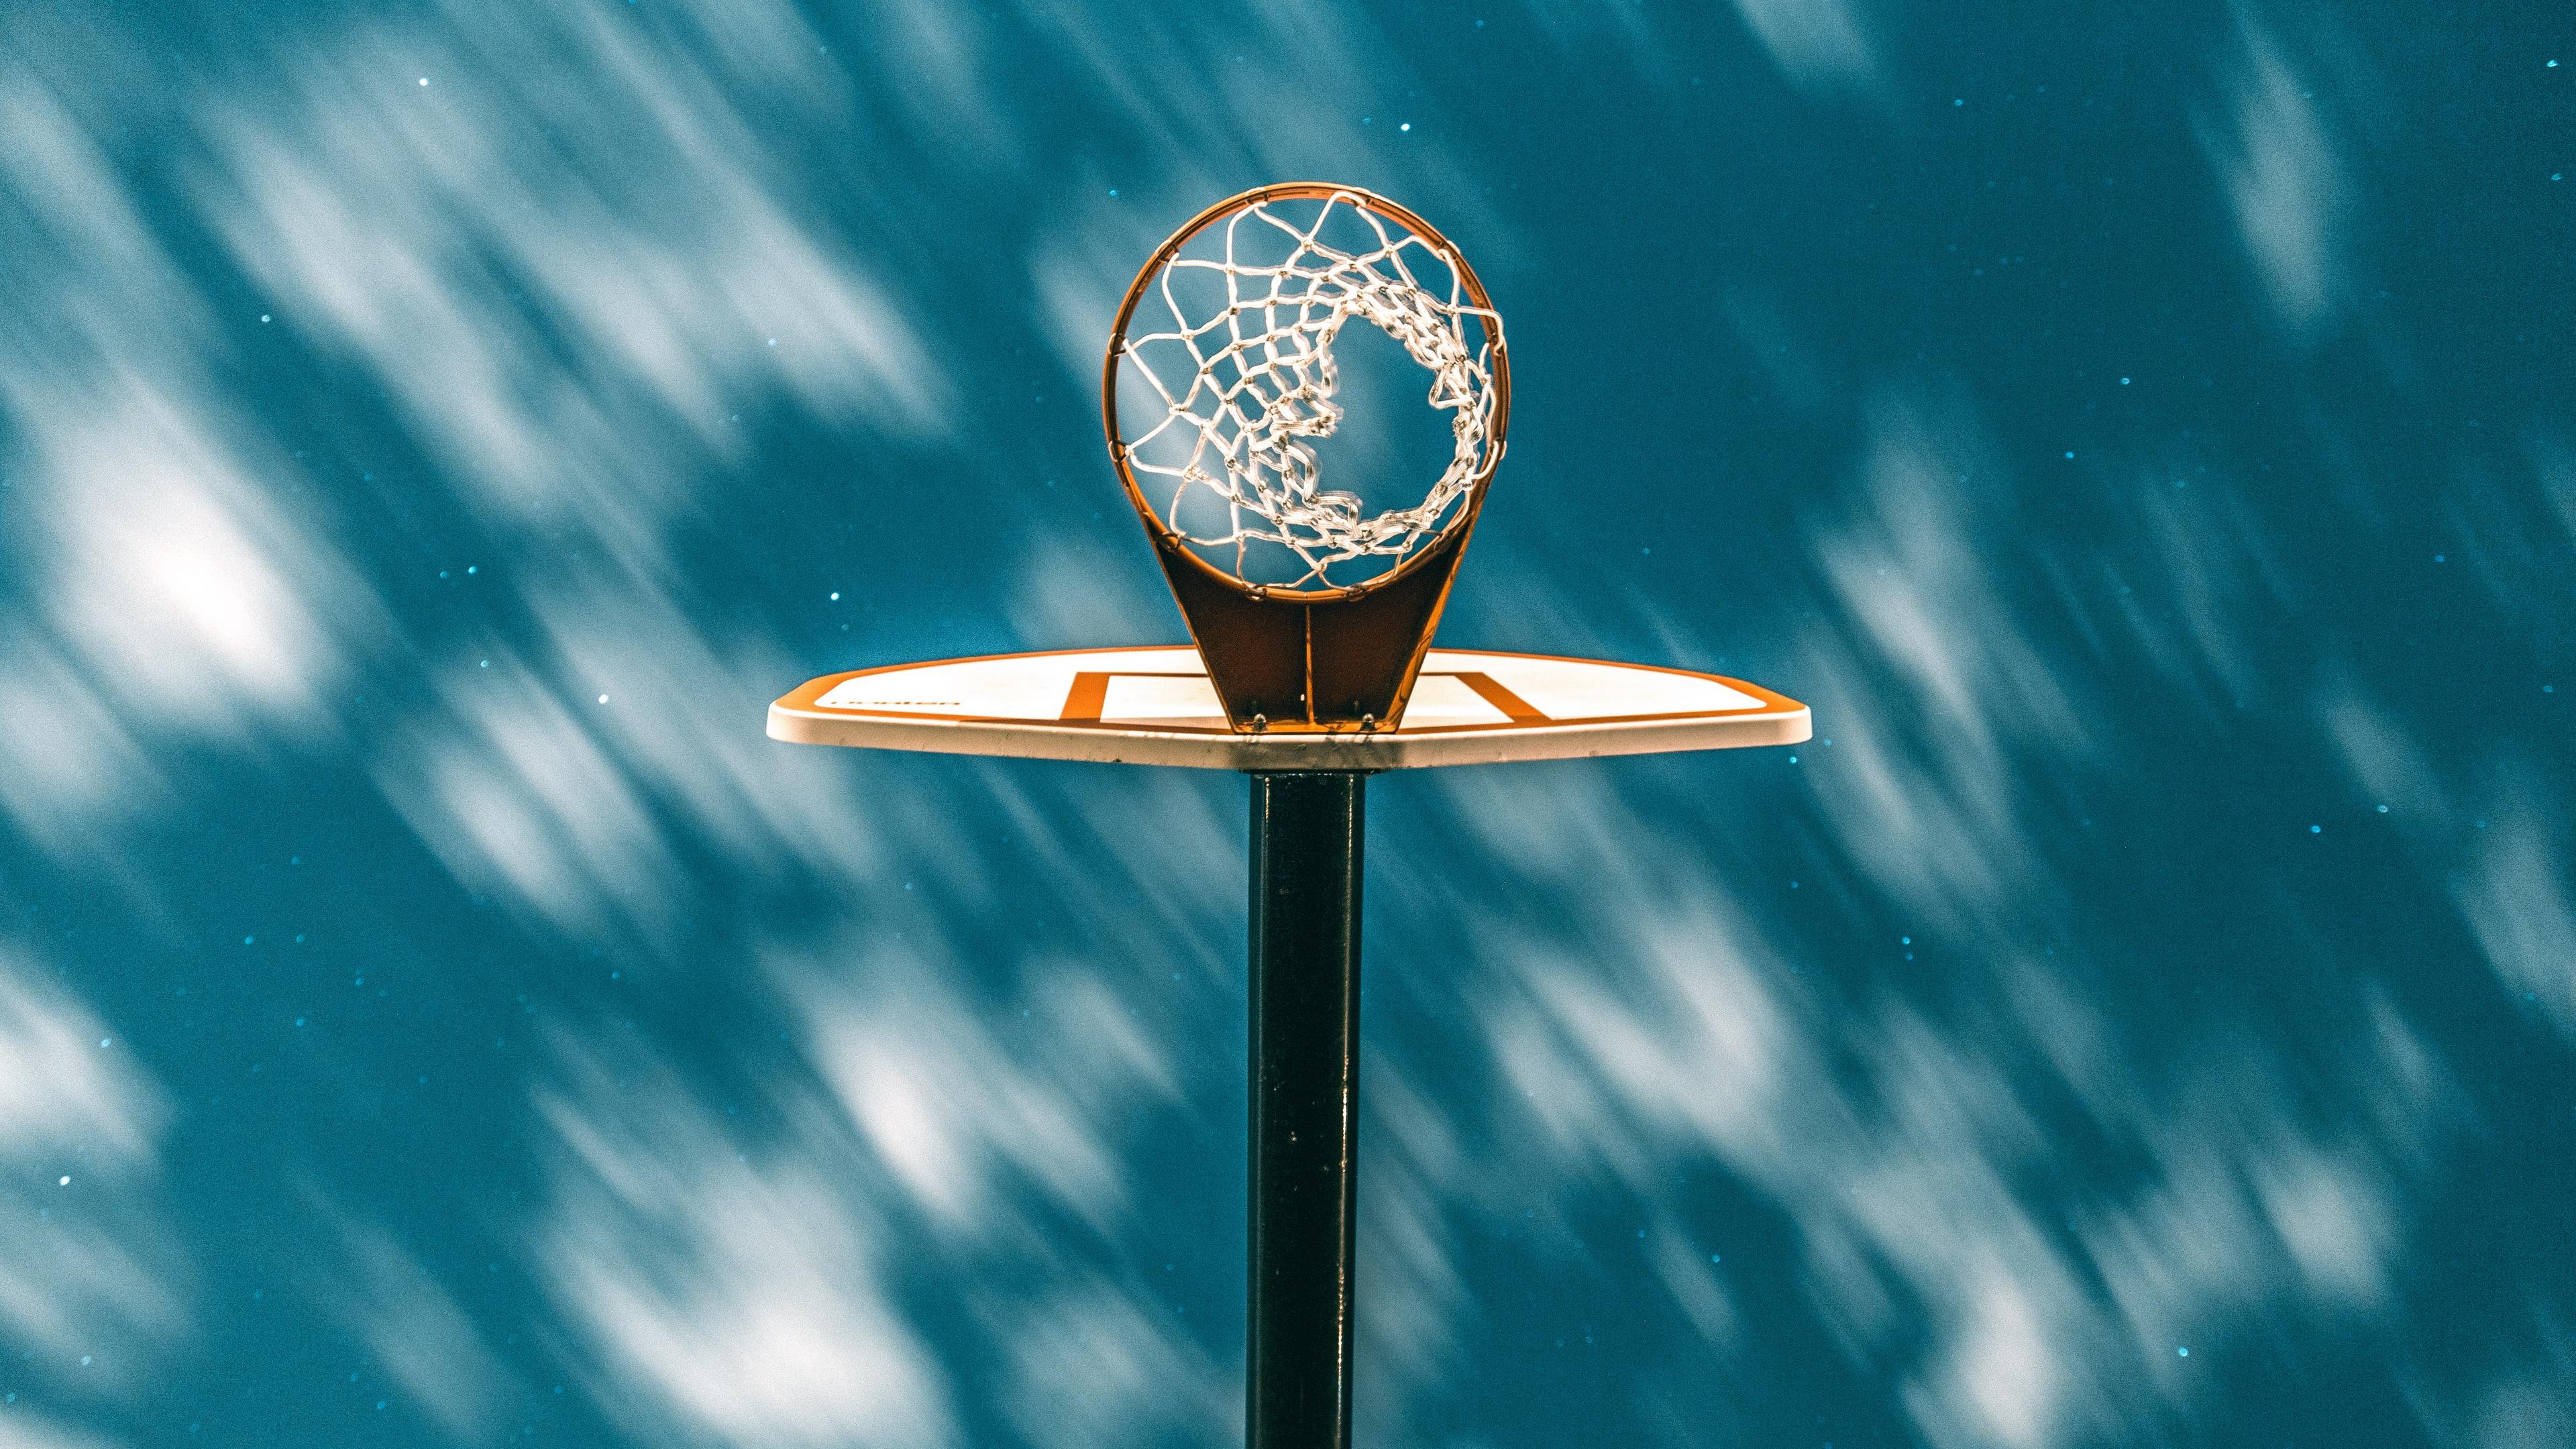 basketball ring basketball grid starry sky clouds 4k 1540062501 - basketball ring, basketball, grid, starry sky, clouds 4k - Grid, basketball ring, Basketball